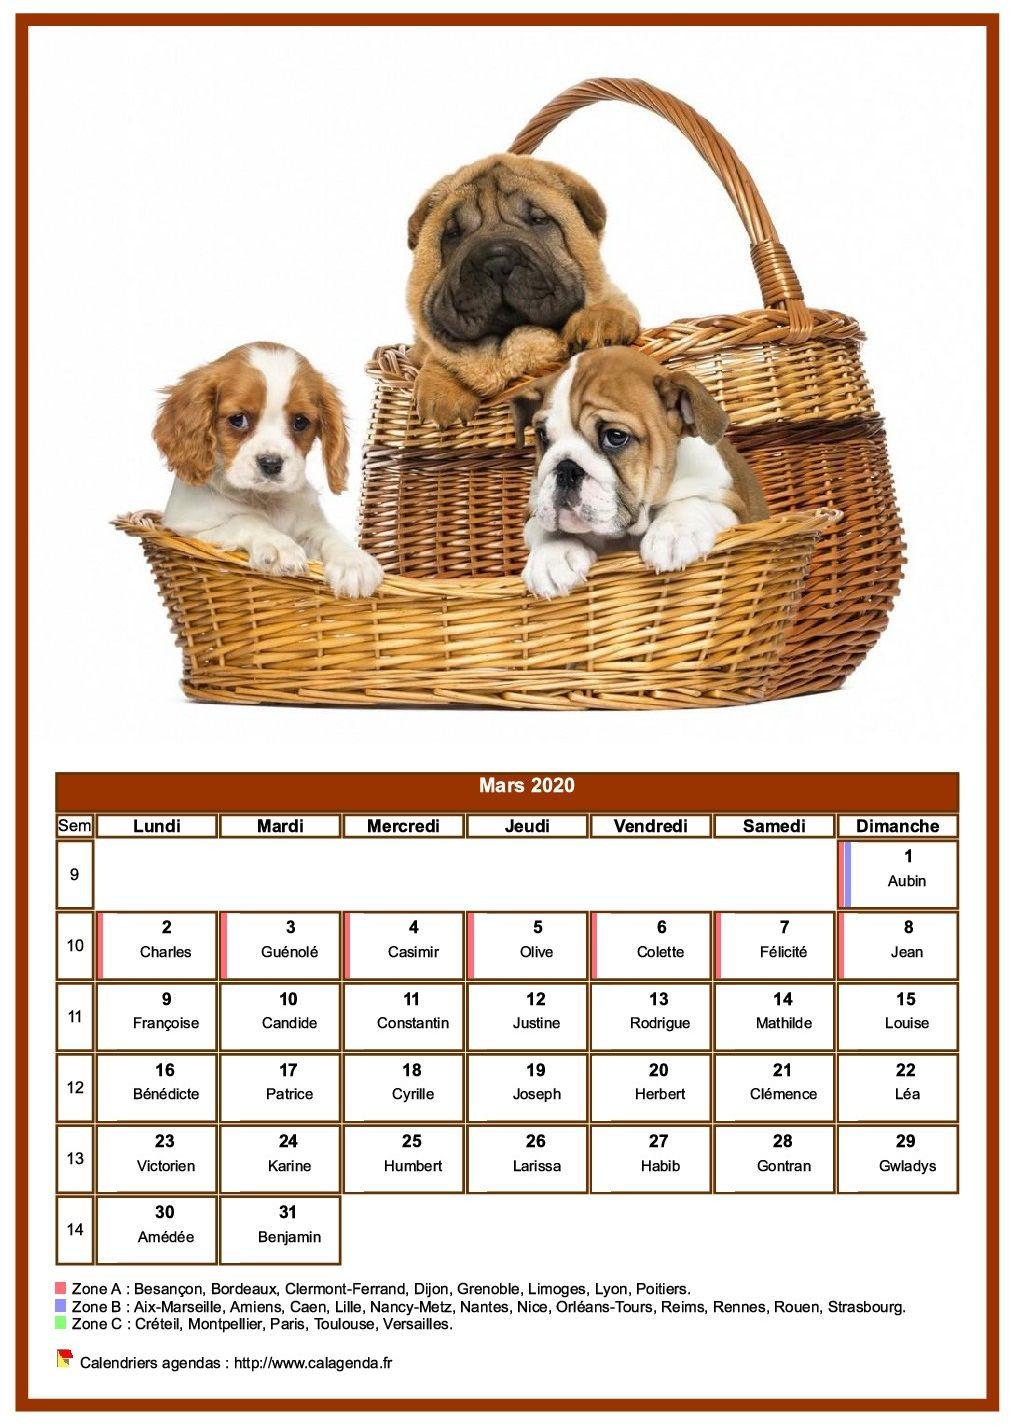 Calendrier mars 2020 chiens